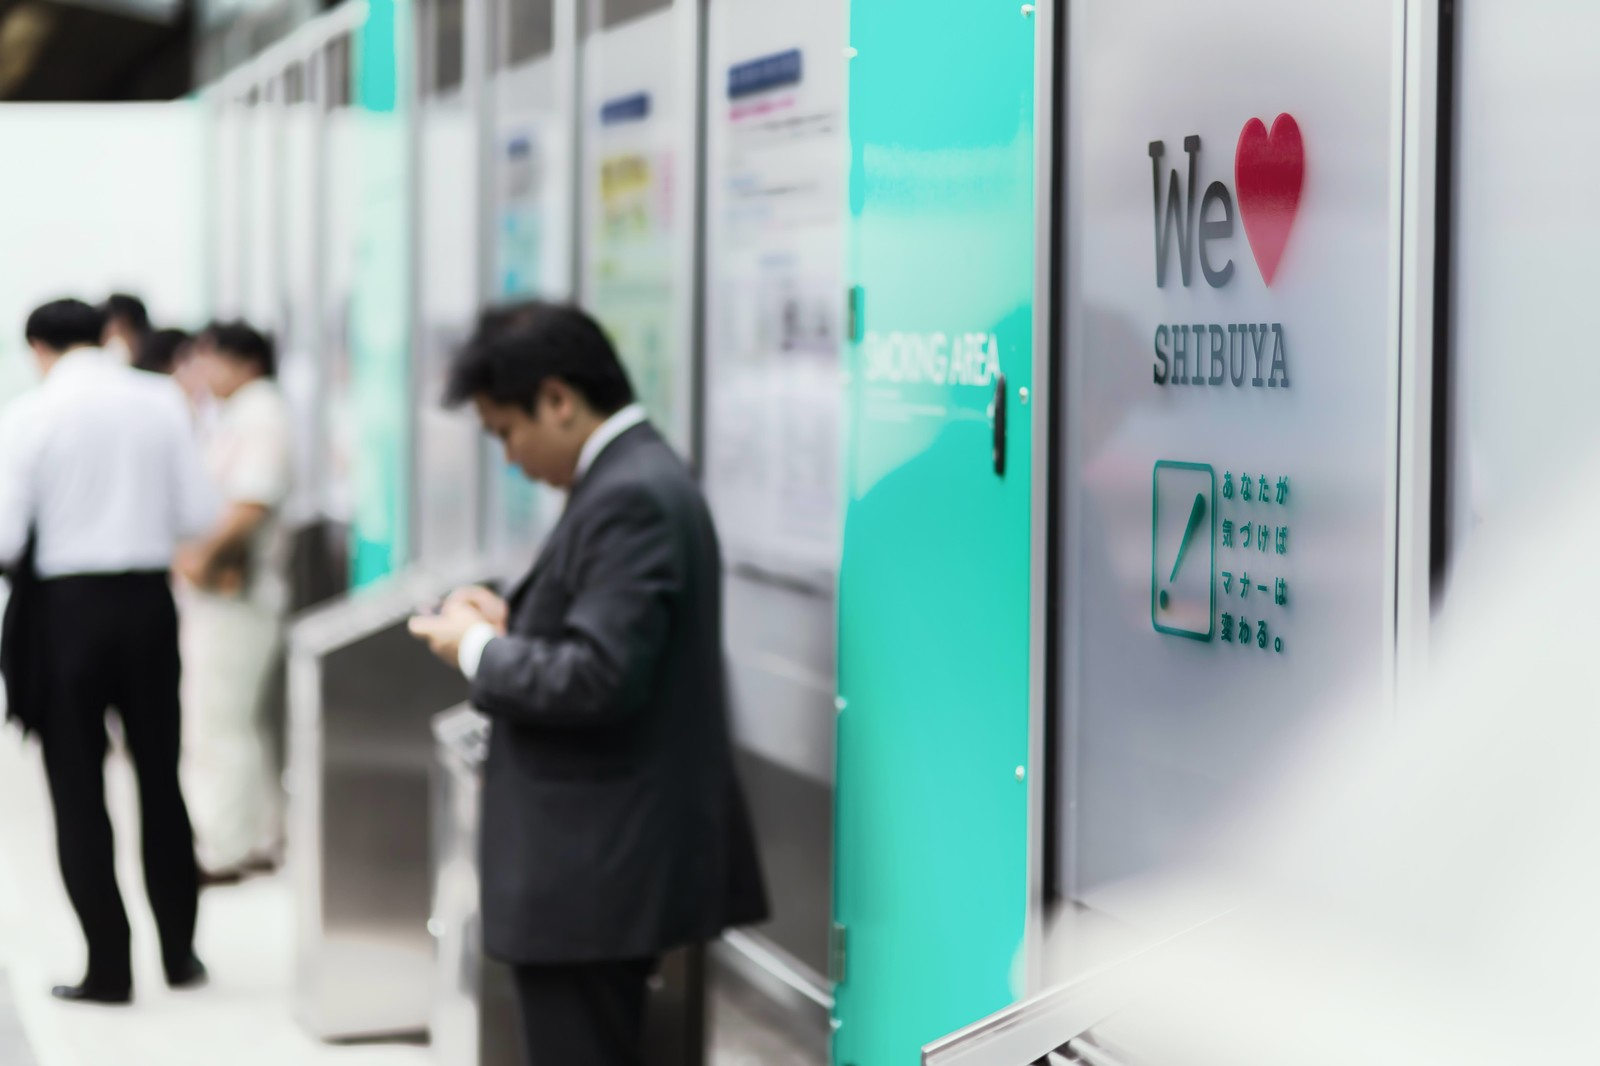 「we love shibuya(喫煙所)」の写真